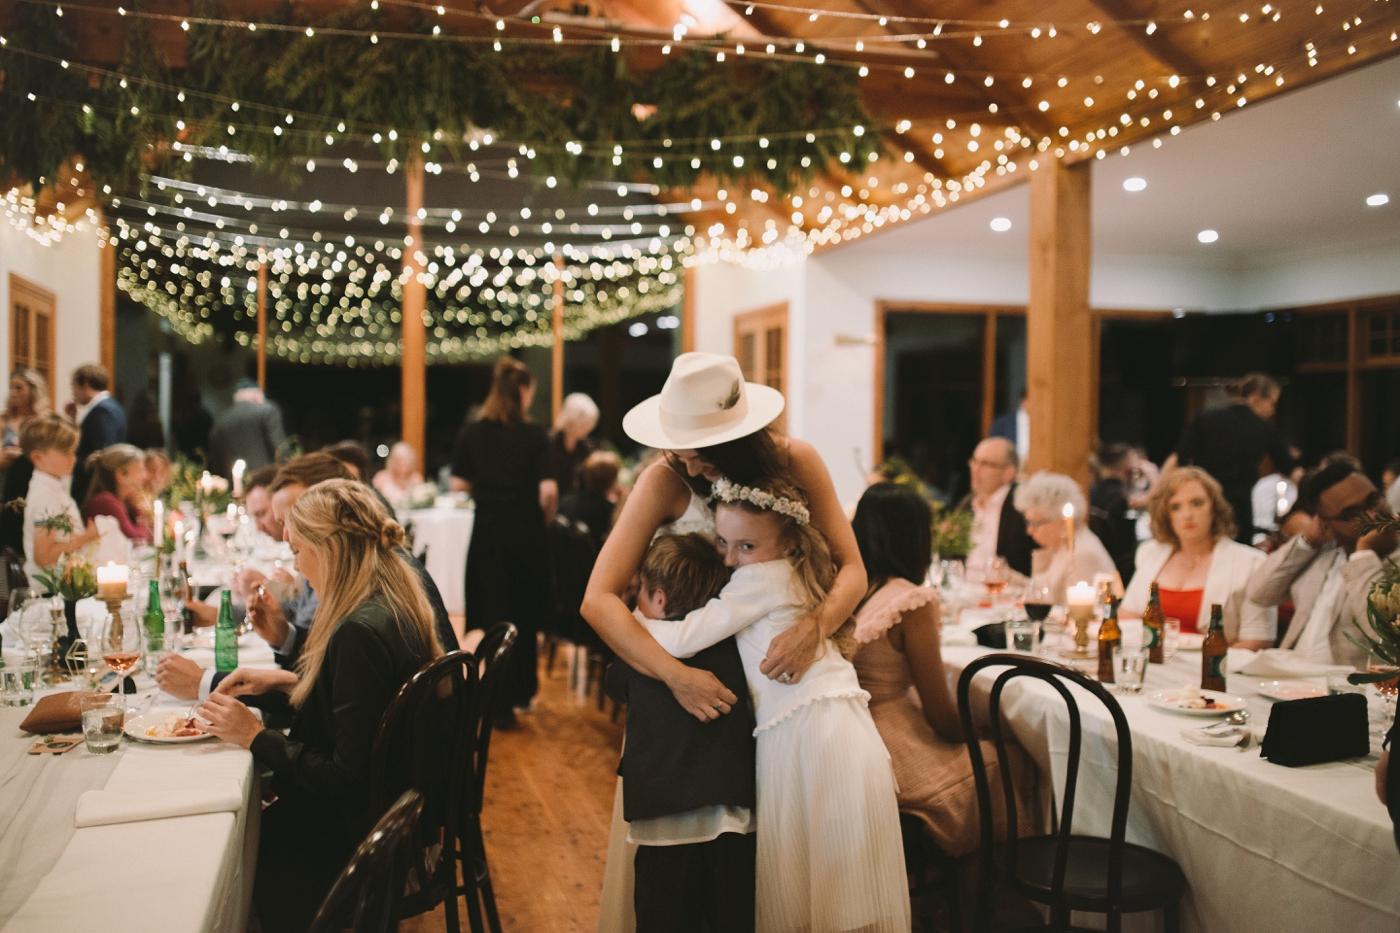 Maddy & Wes - K1 by Geoff Hardy Wedding - Adelaide Wedding Photographer - Natural wedding photography in Adelaide - Katherine Schultz_0080.jpg